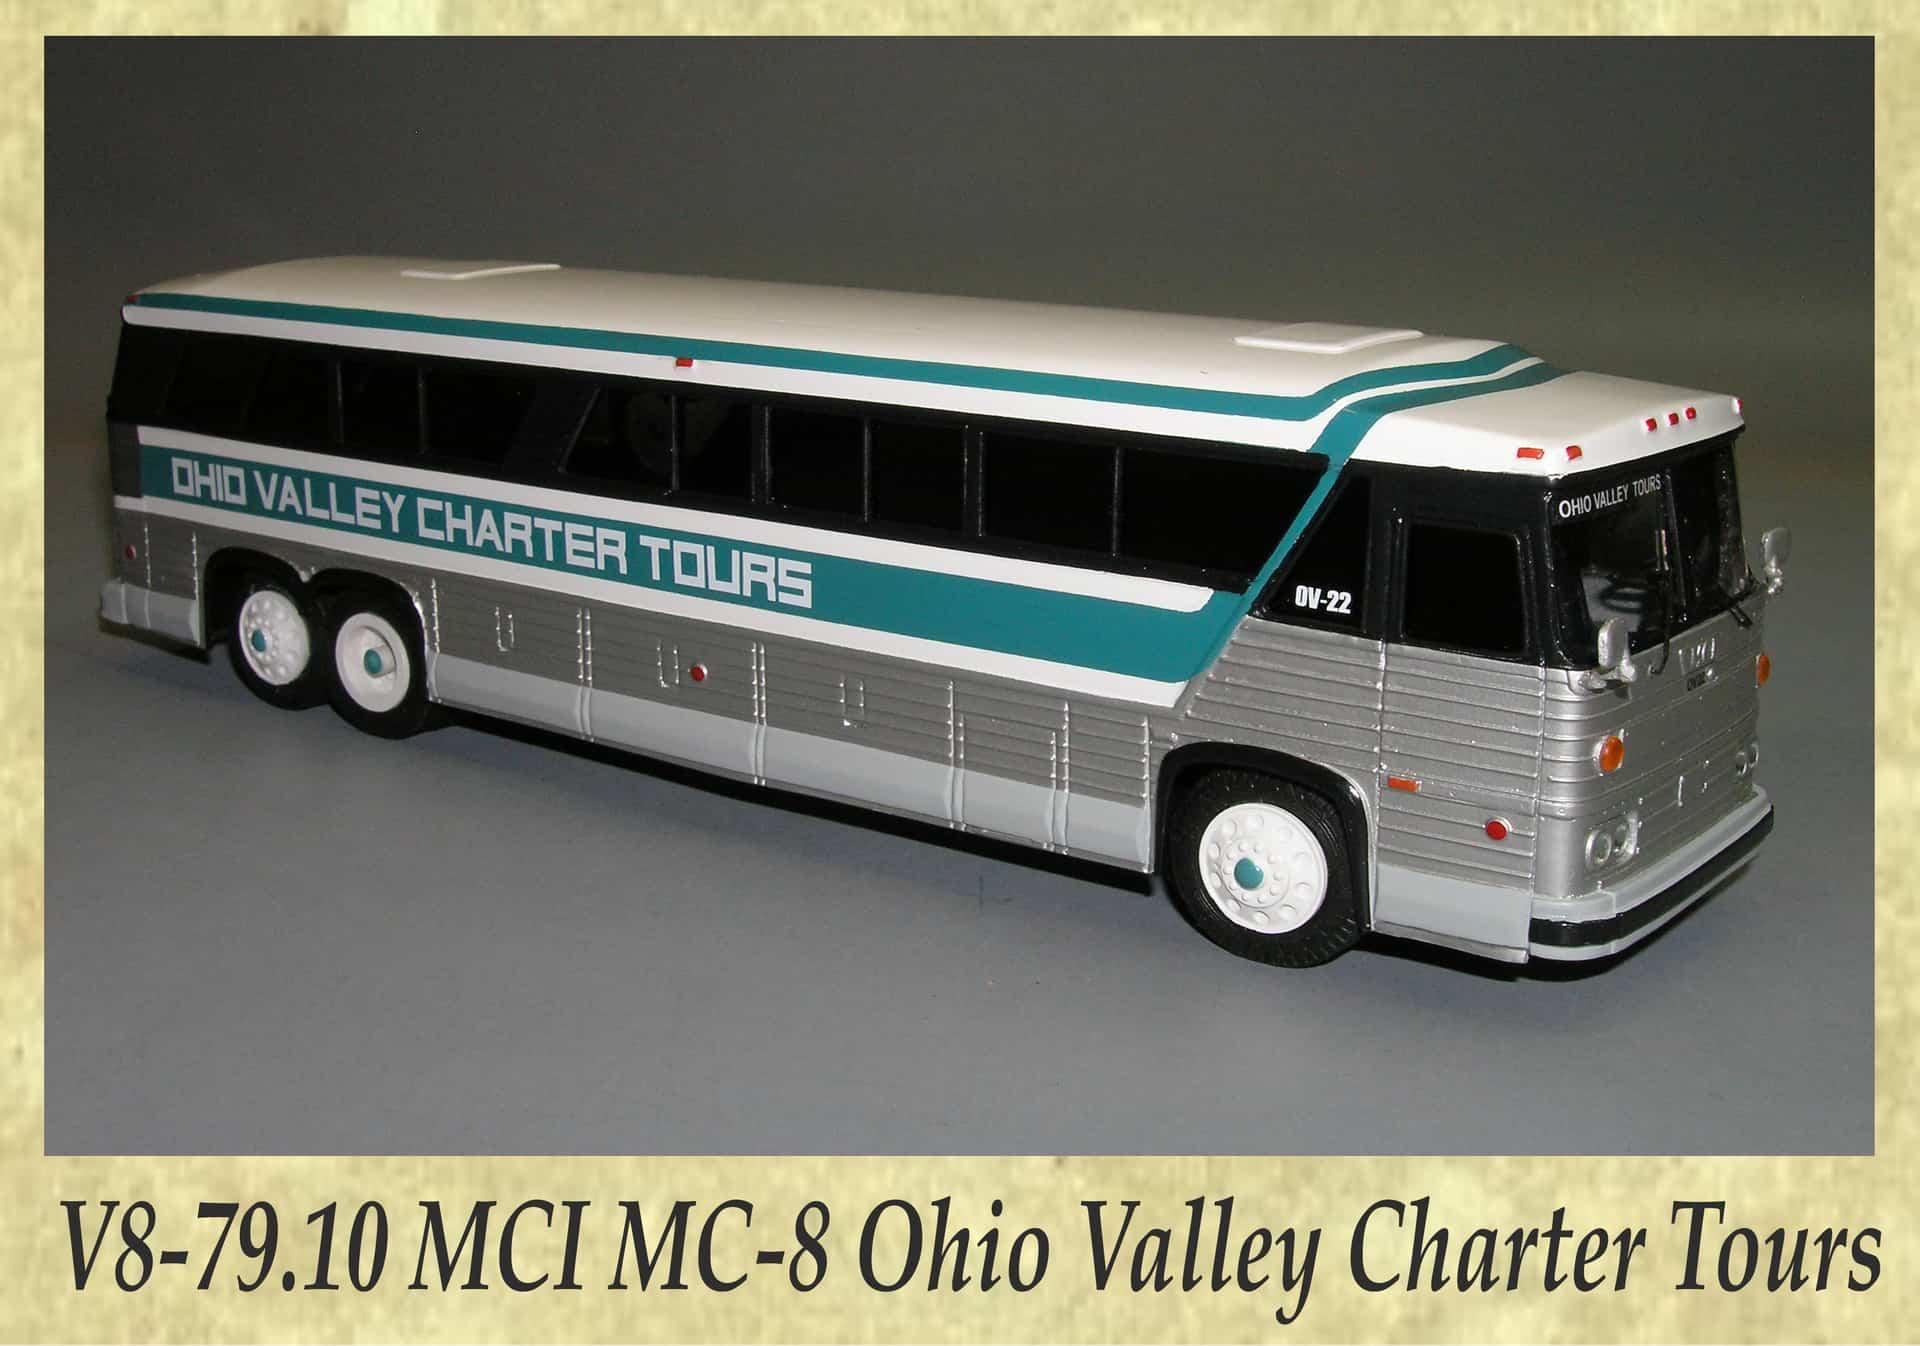 V8-79.10 MCI MC-8 Ohio Valley Charter Tours